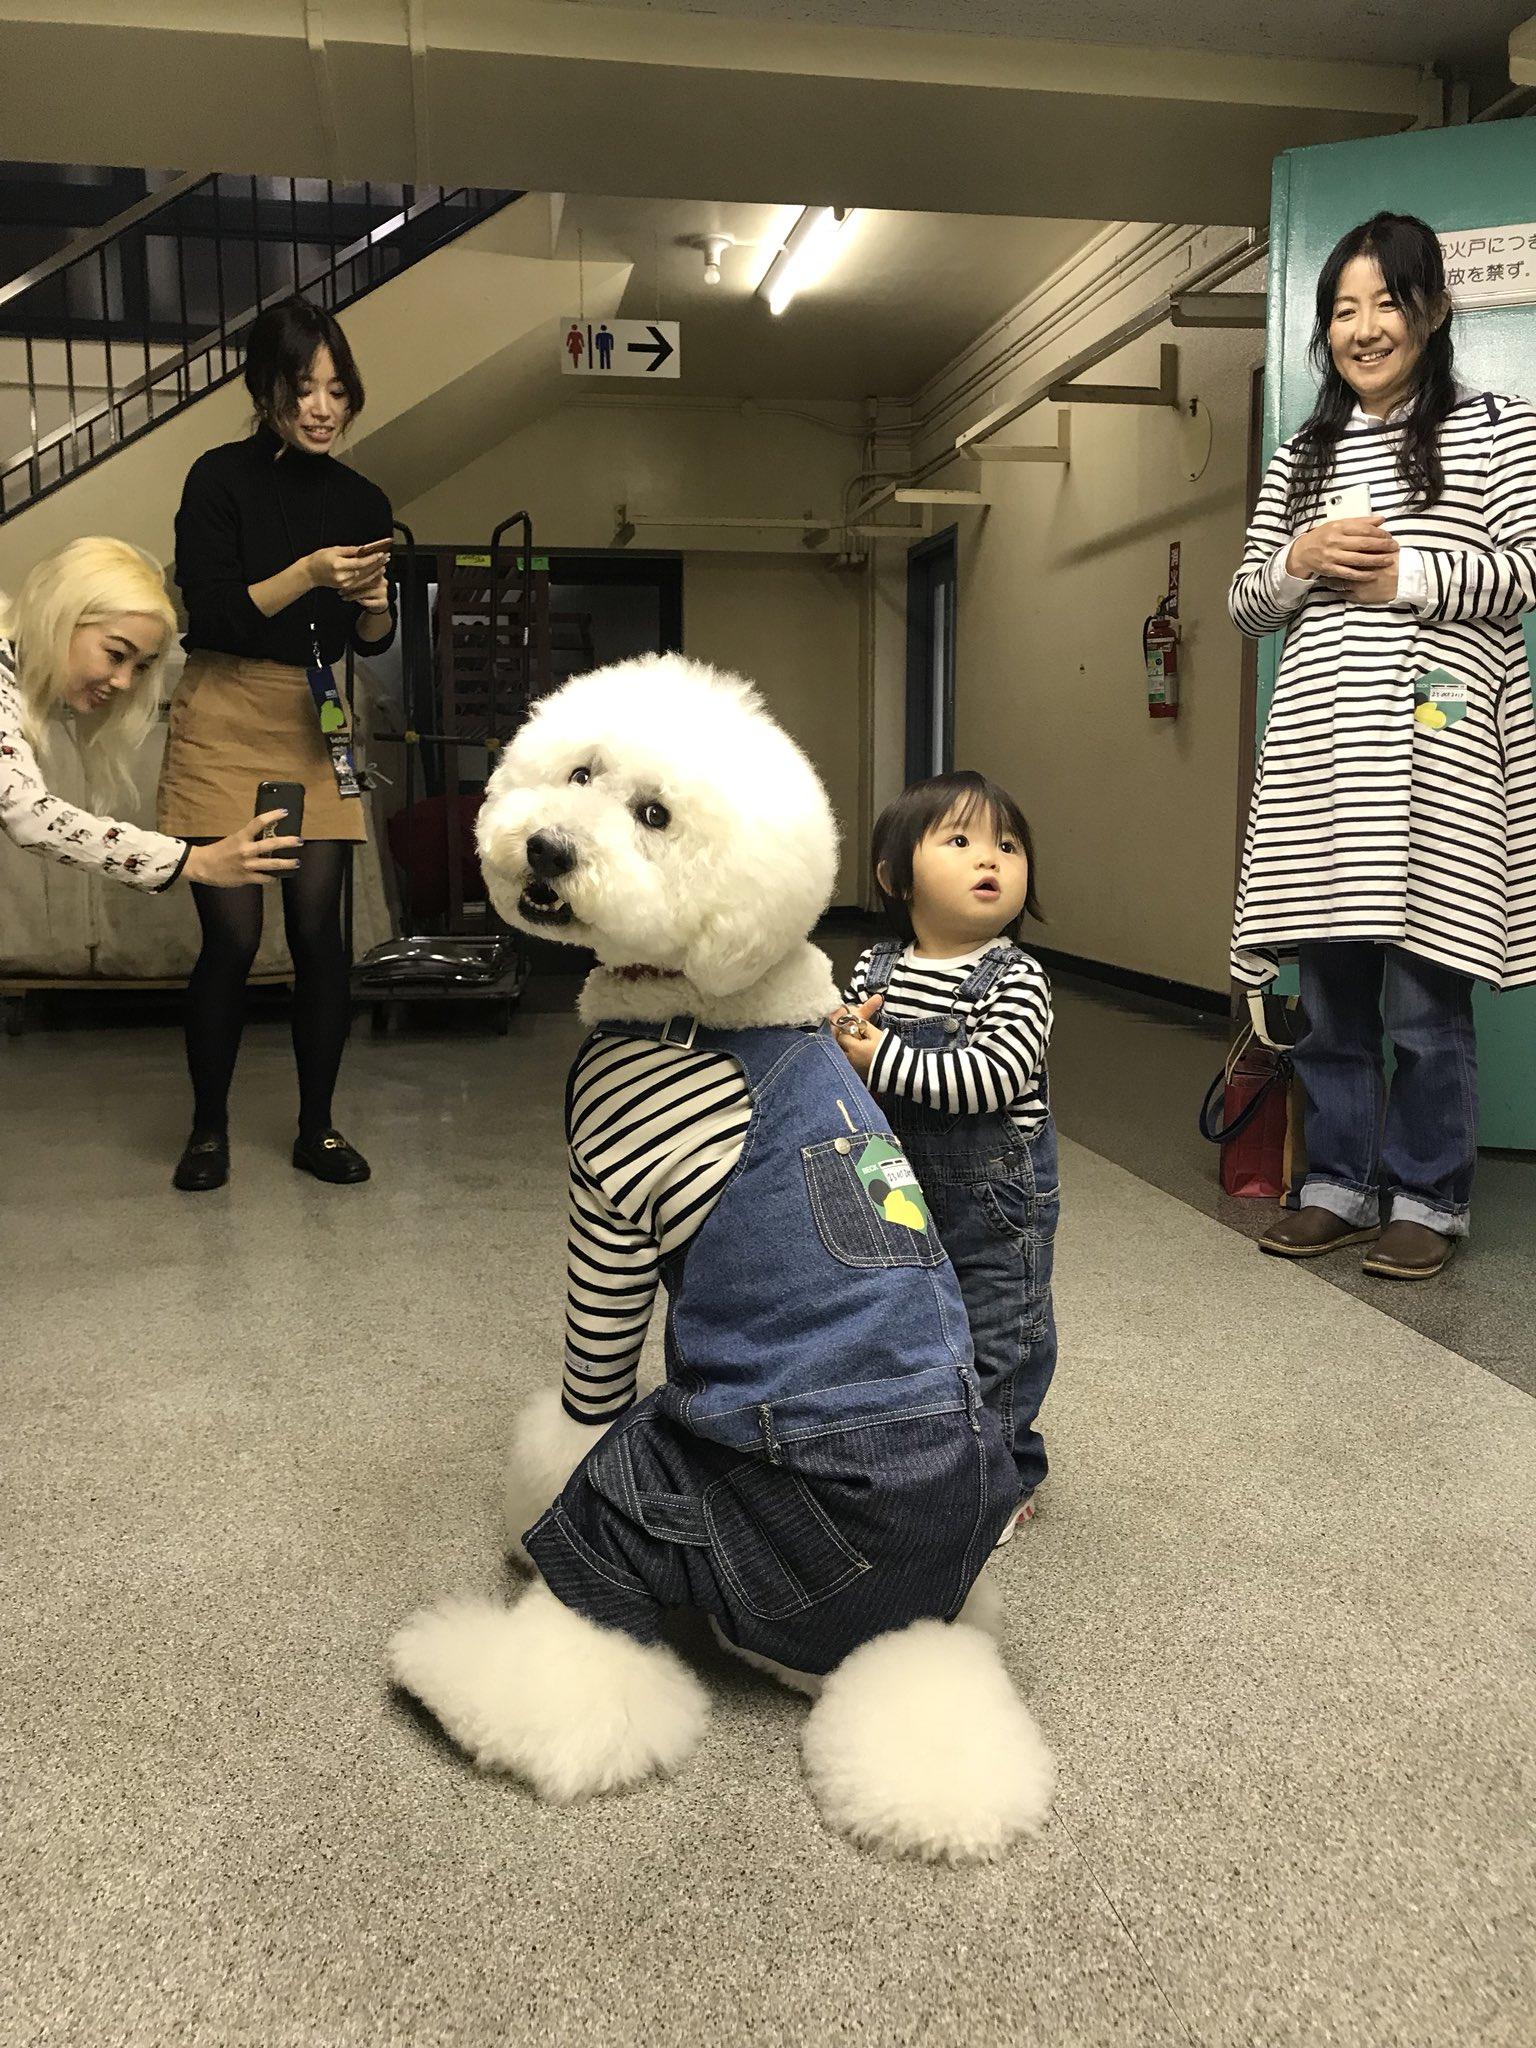 I ❤️ Tokyo https://t.co/3Obzet2fDk